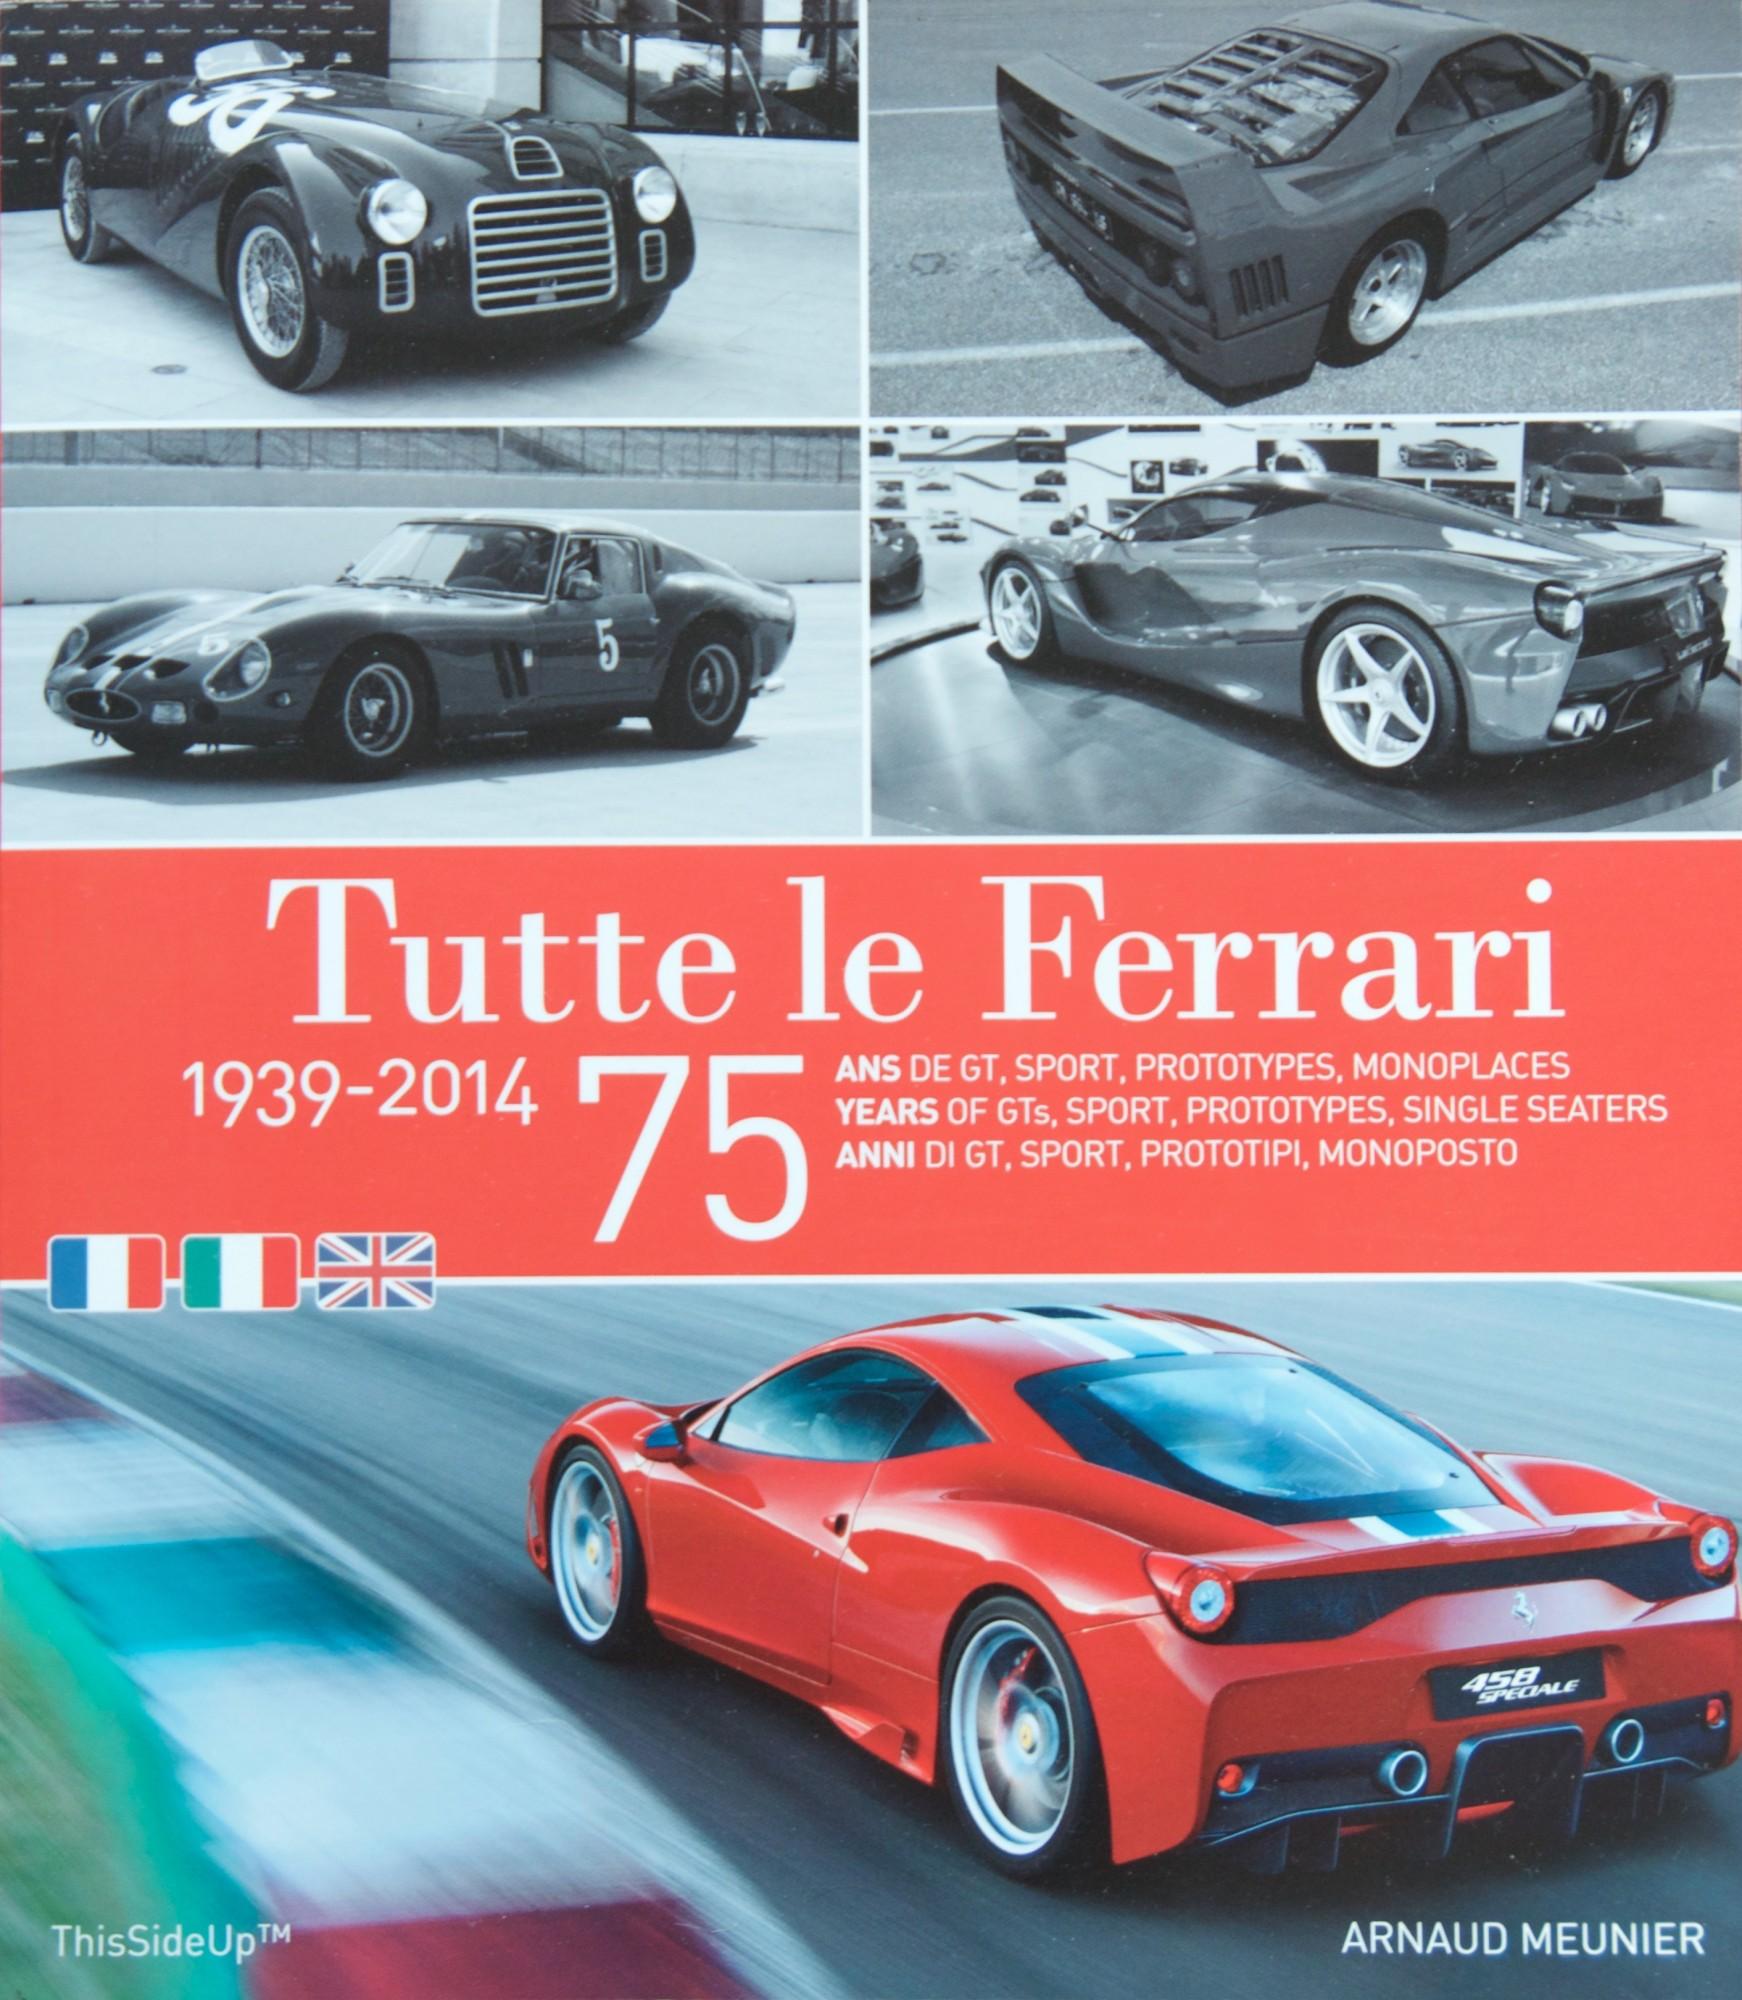 Tutte le Ferrari - Arnaud Meunier